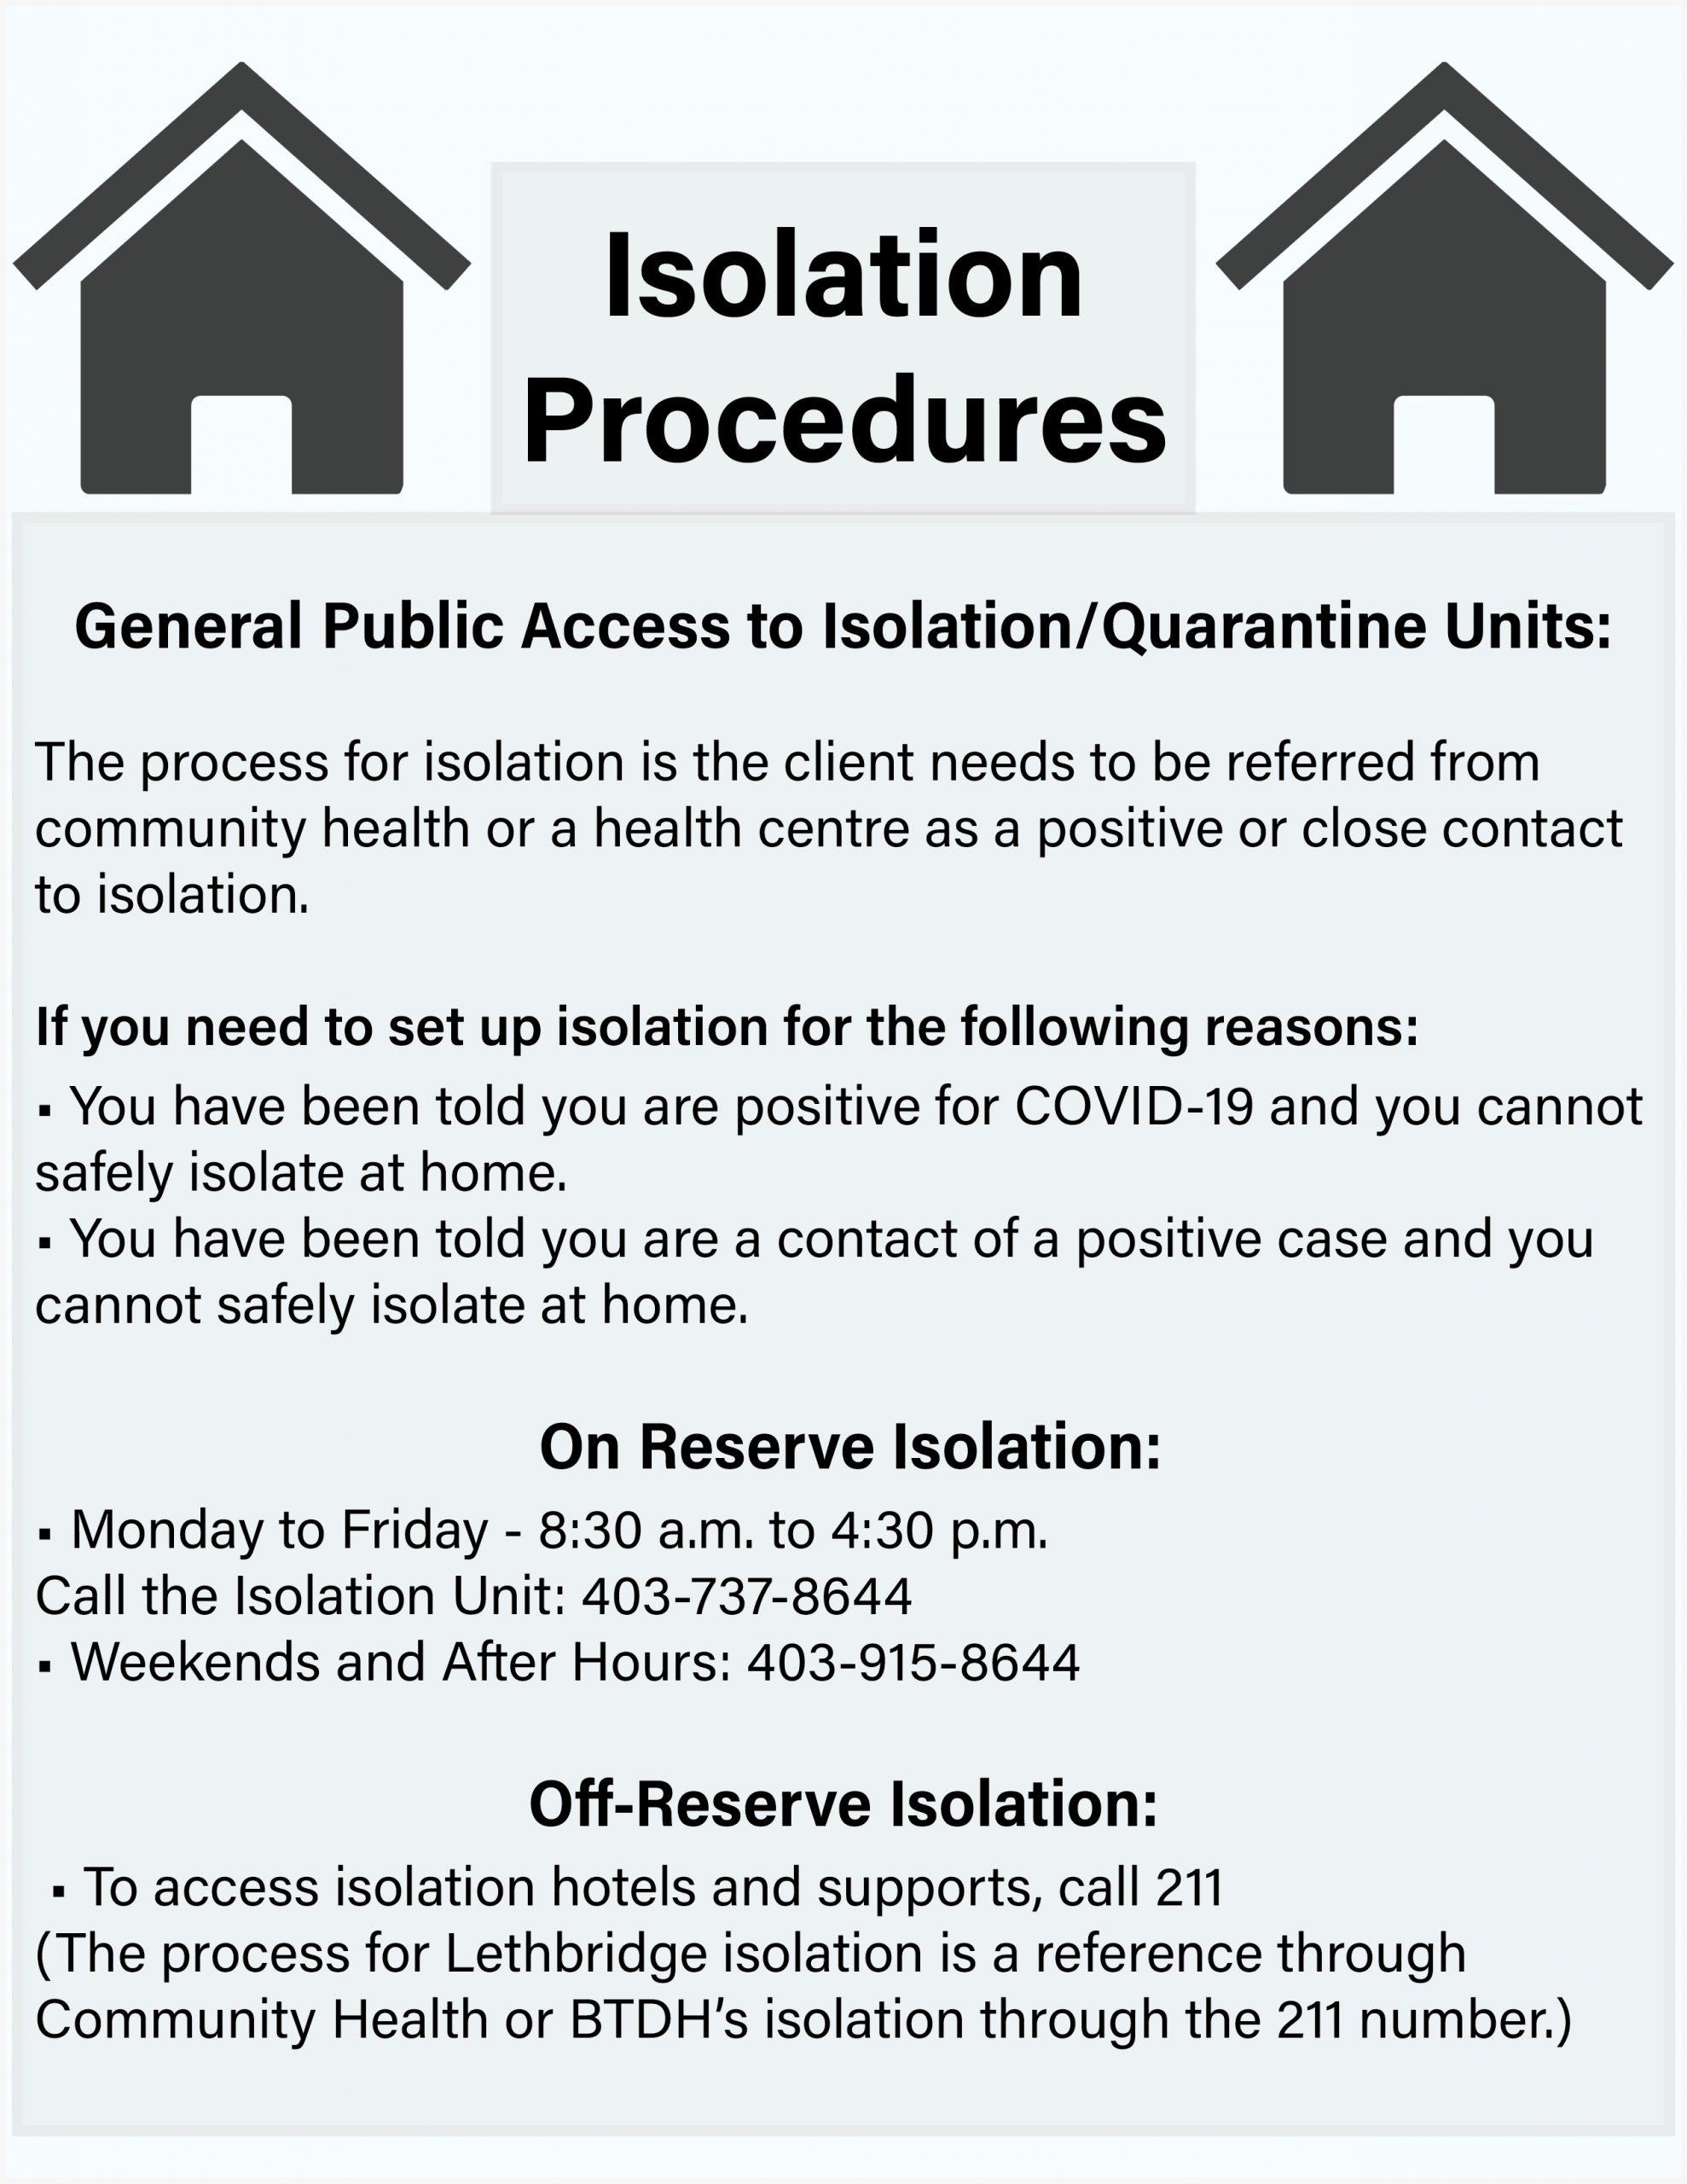 Isolation & Quarantine Procedures - On and Off Reserve